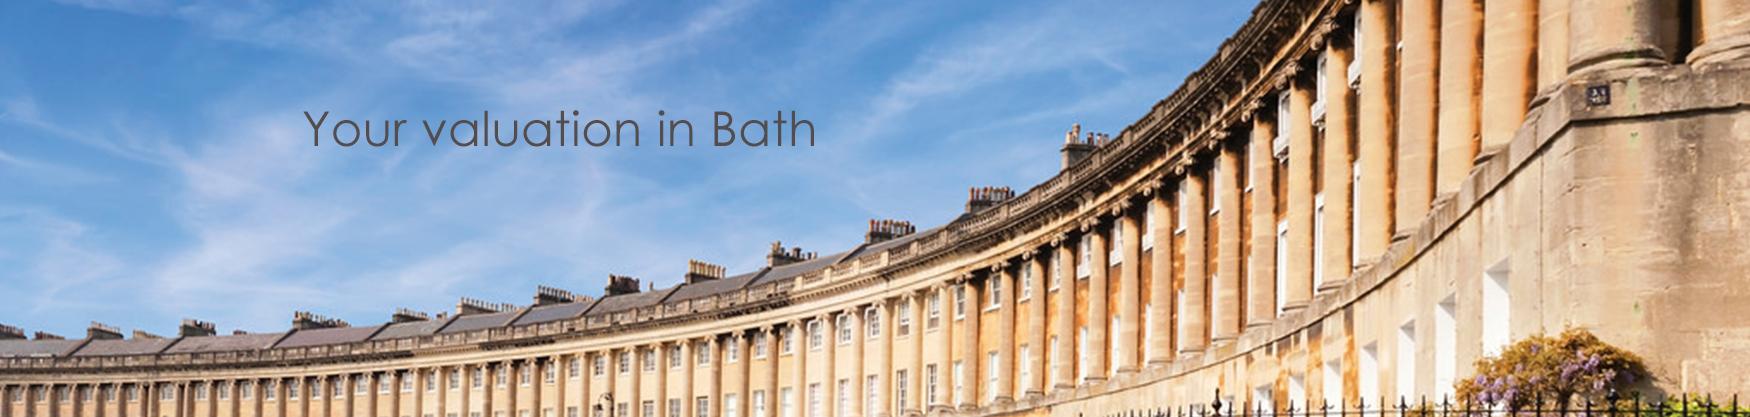 estate agents bath somerset, lettings agents bath somerset